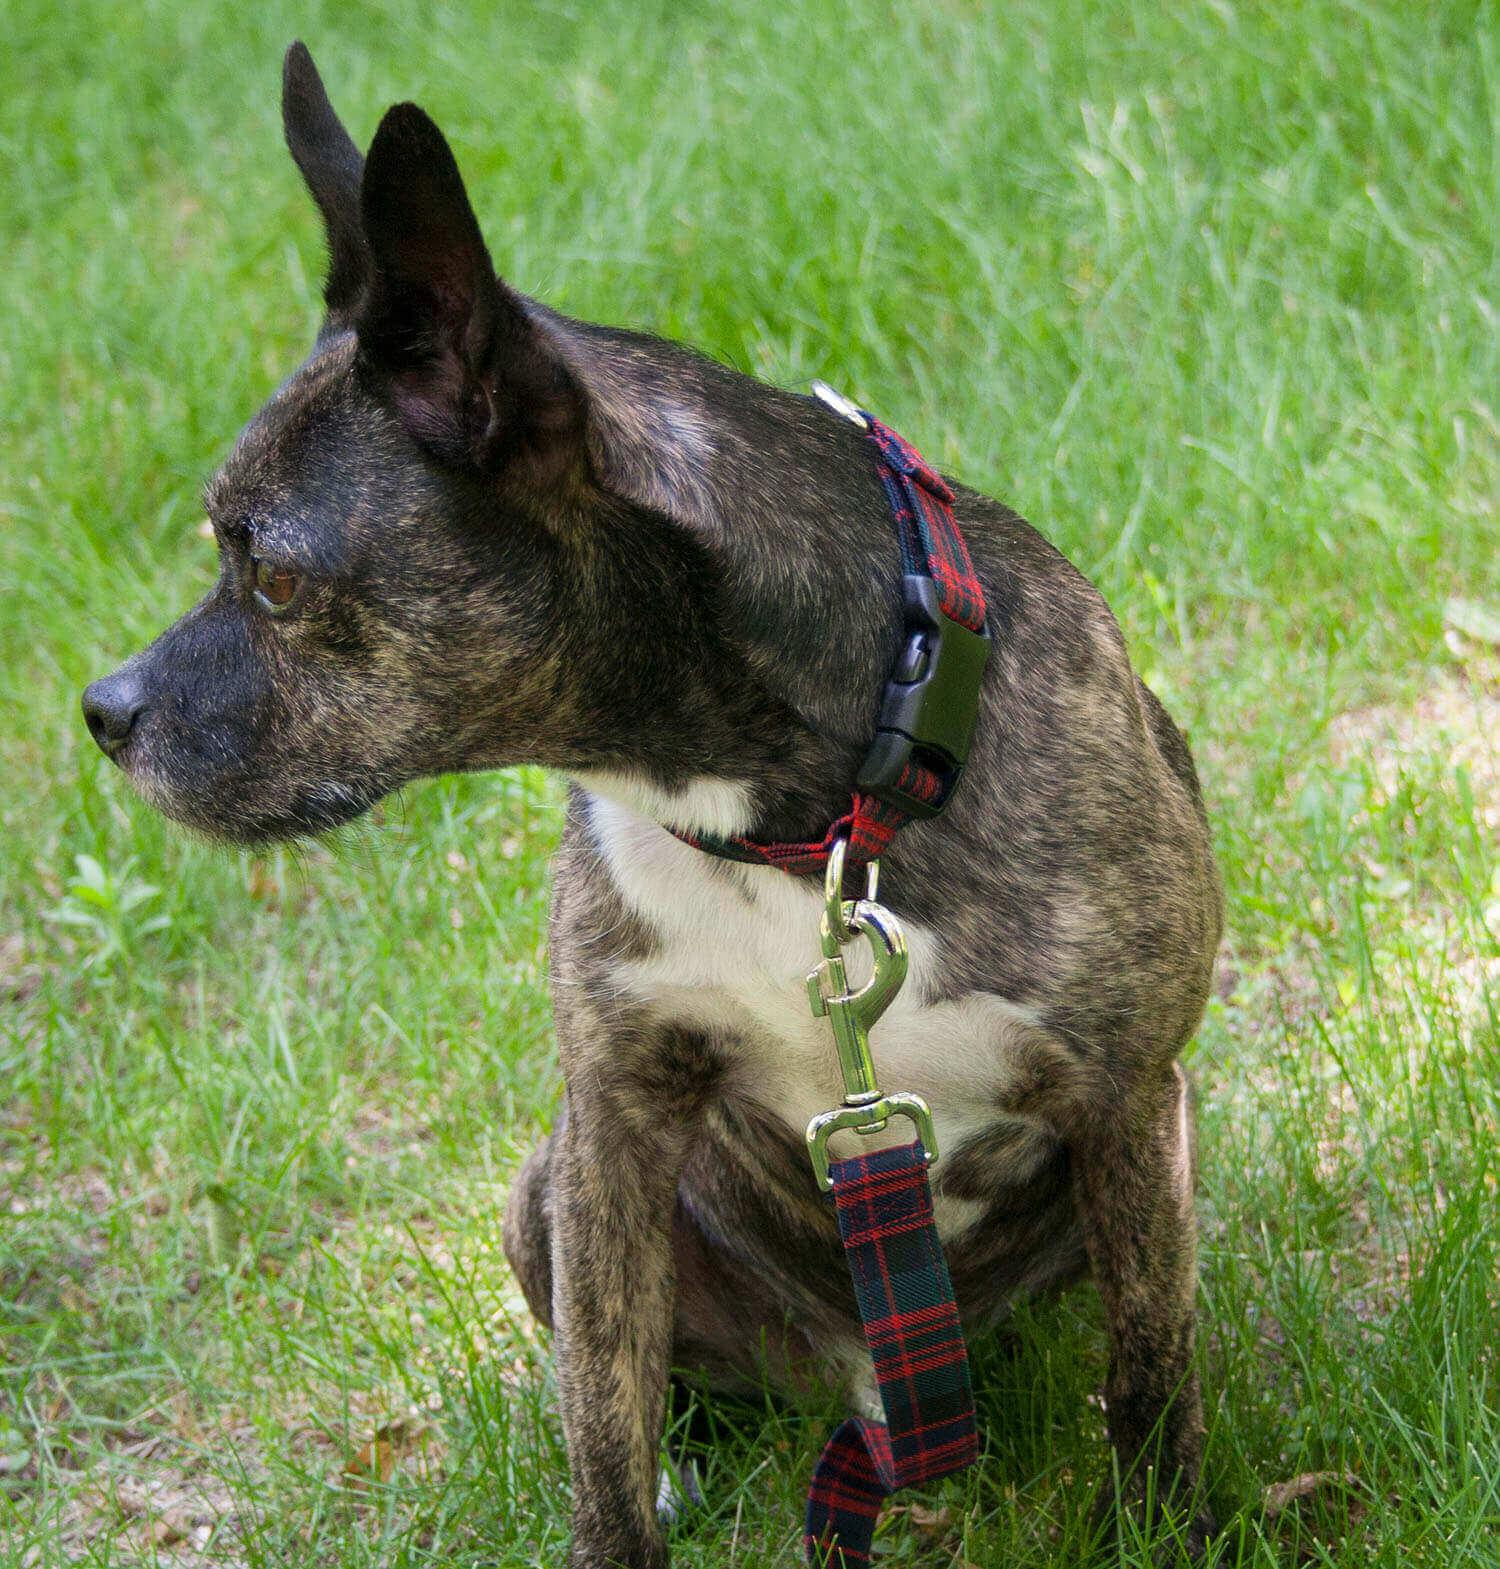 Medium Weight Premium Wool 1-Inch Tartan Dog Collar and Leash Set